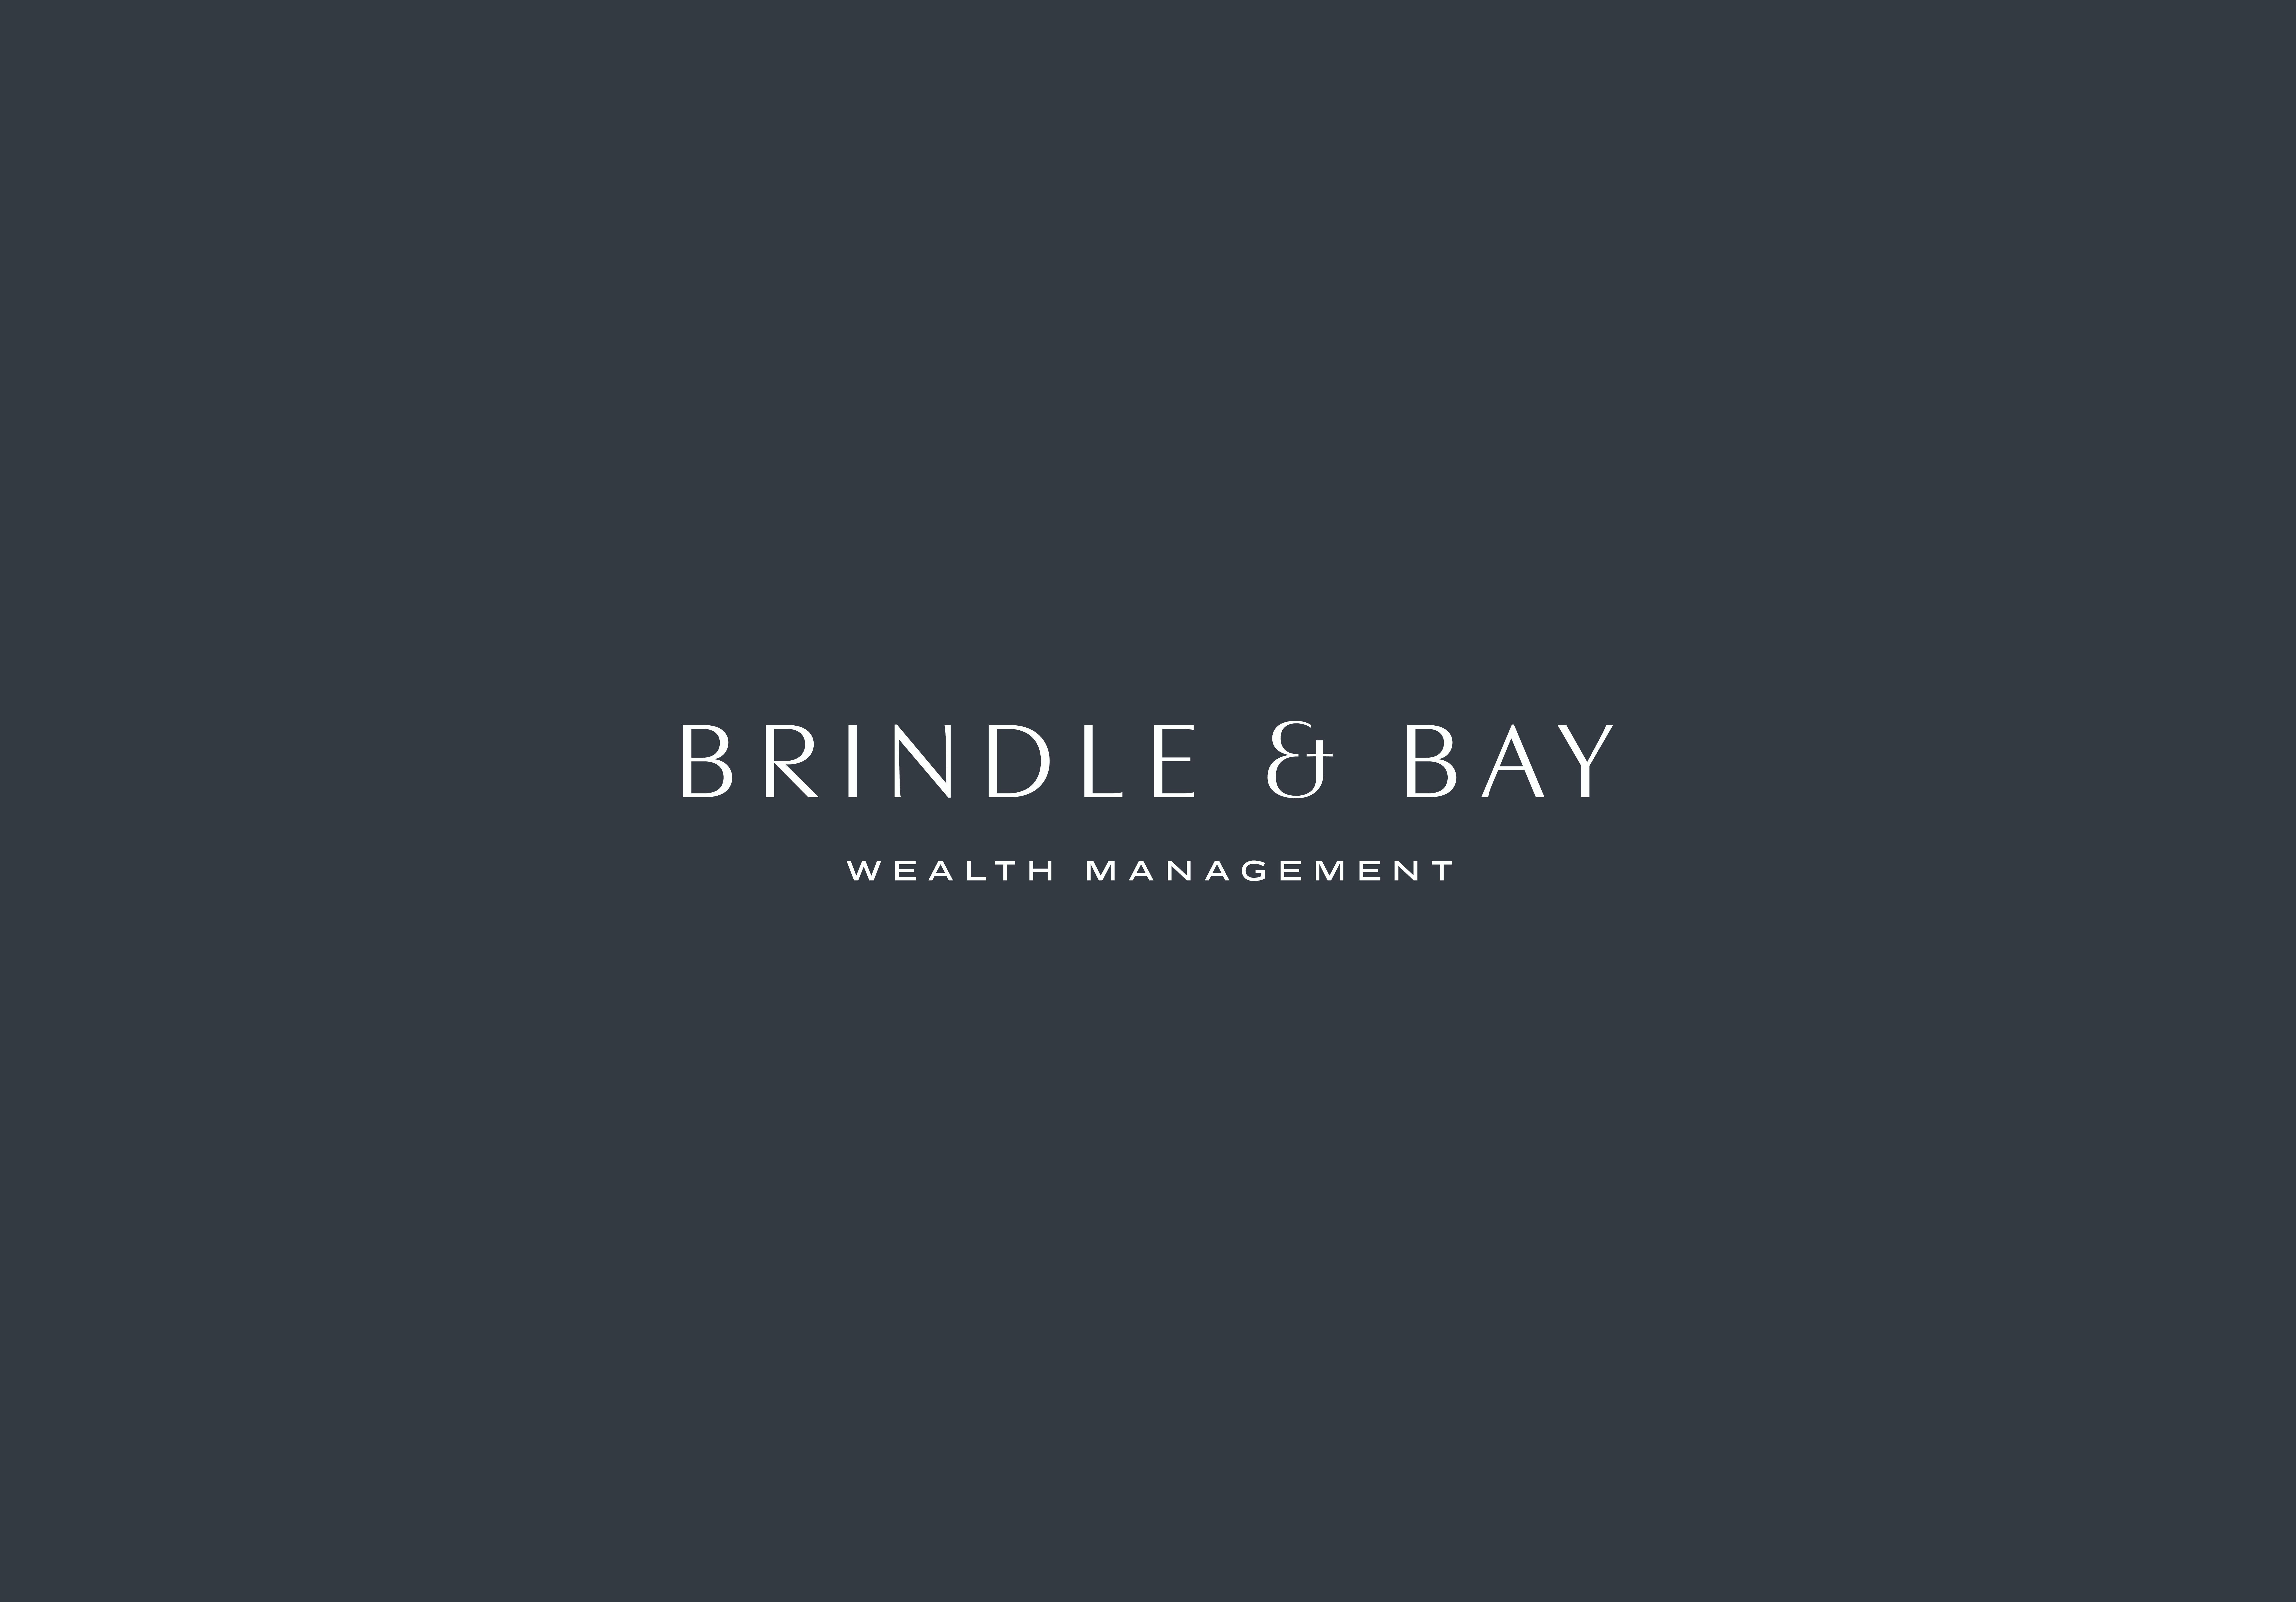 Brindle & Bay Wealth Management logo lockup